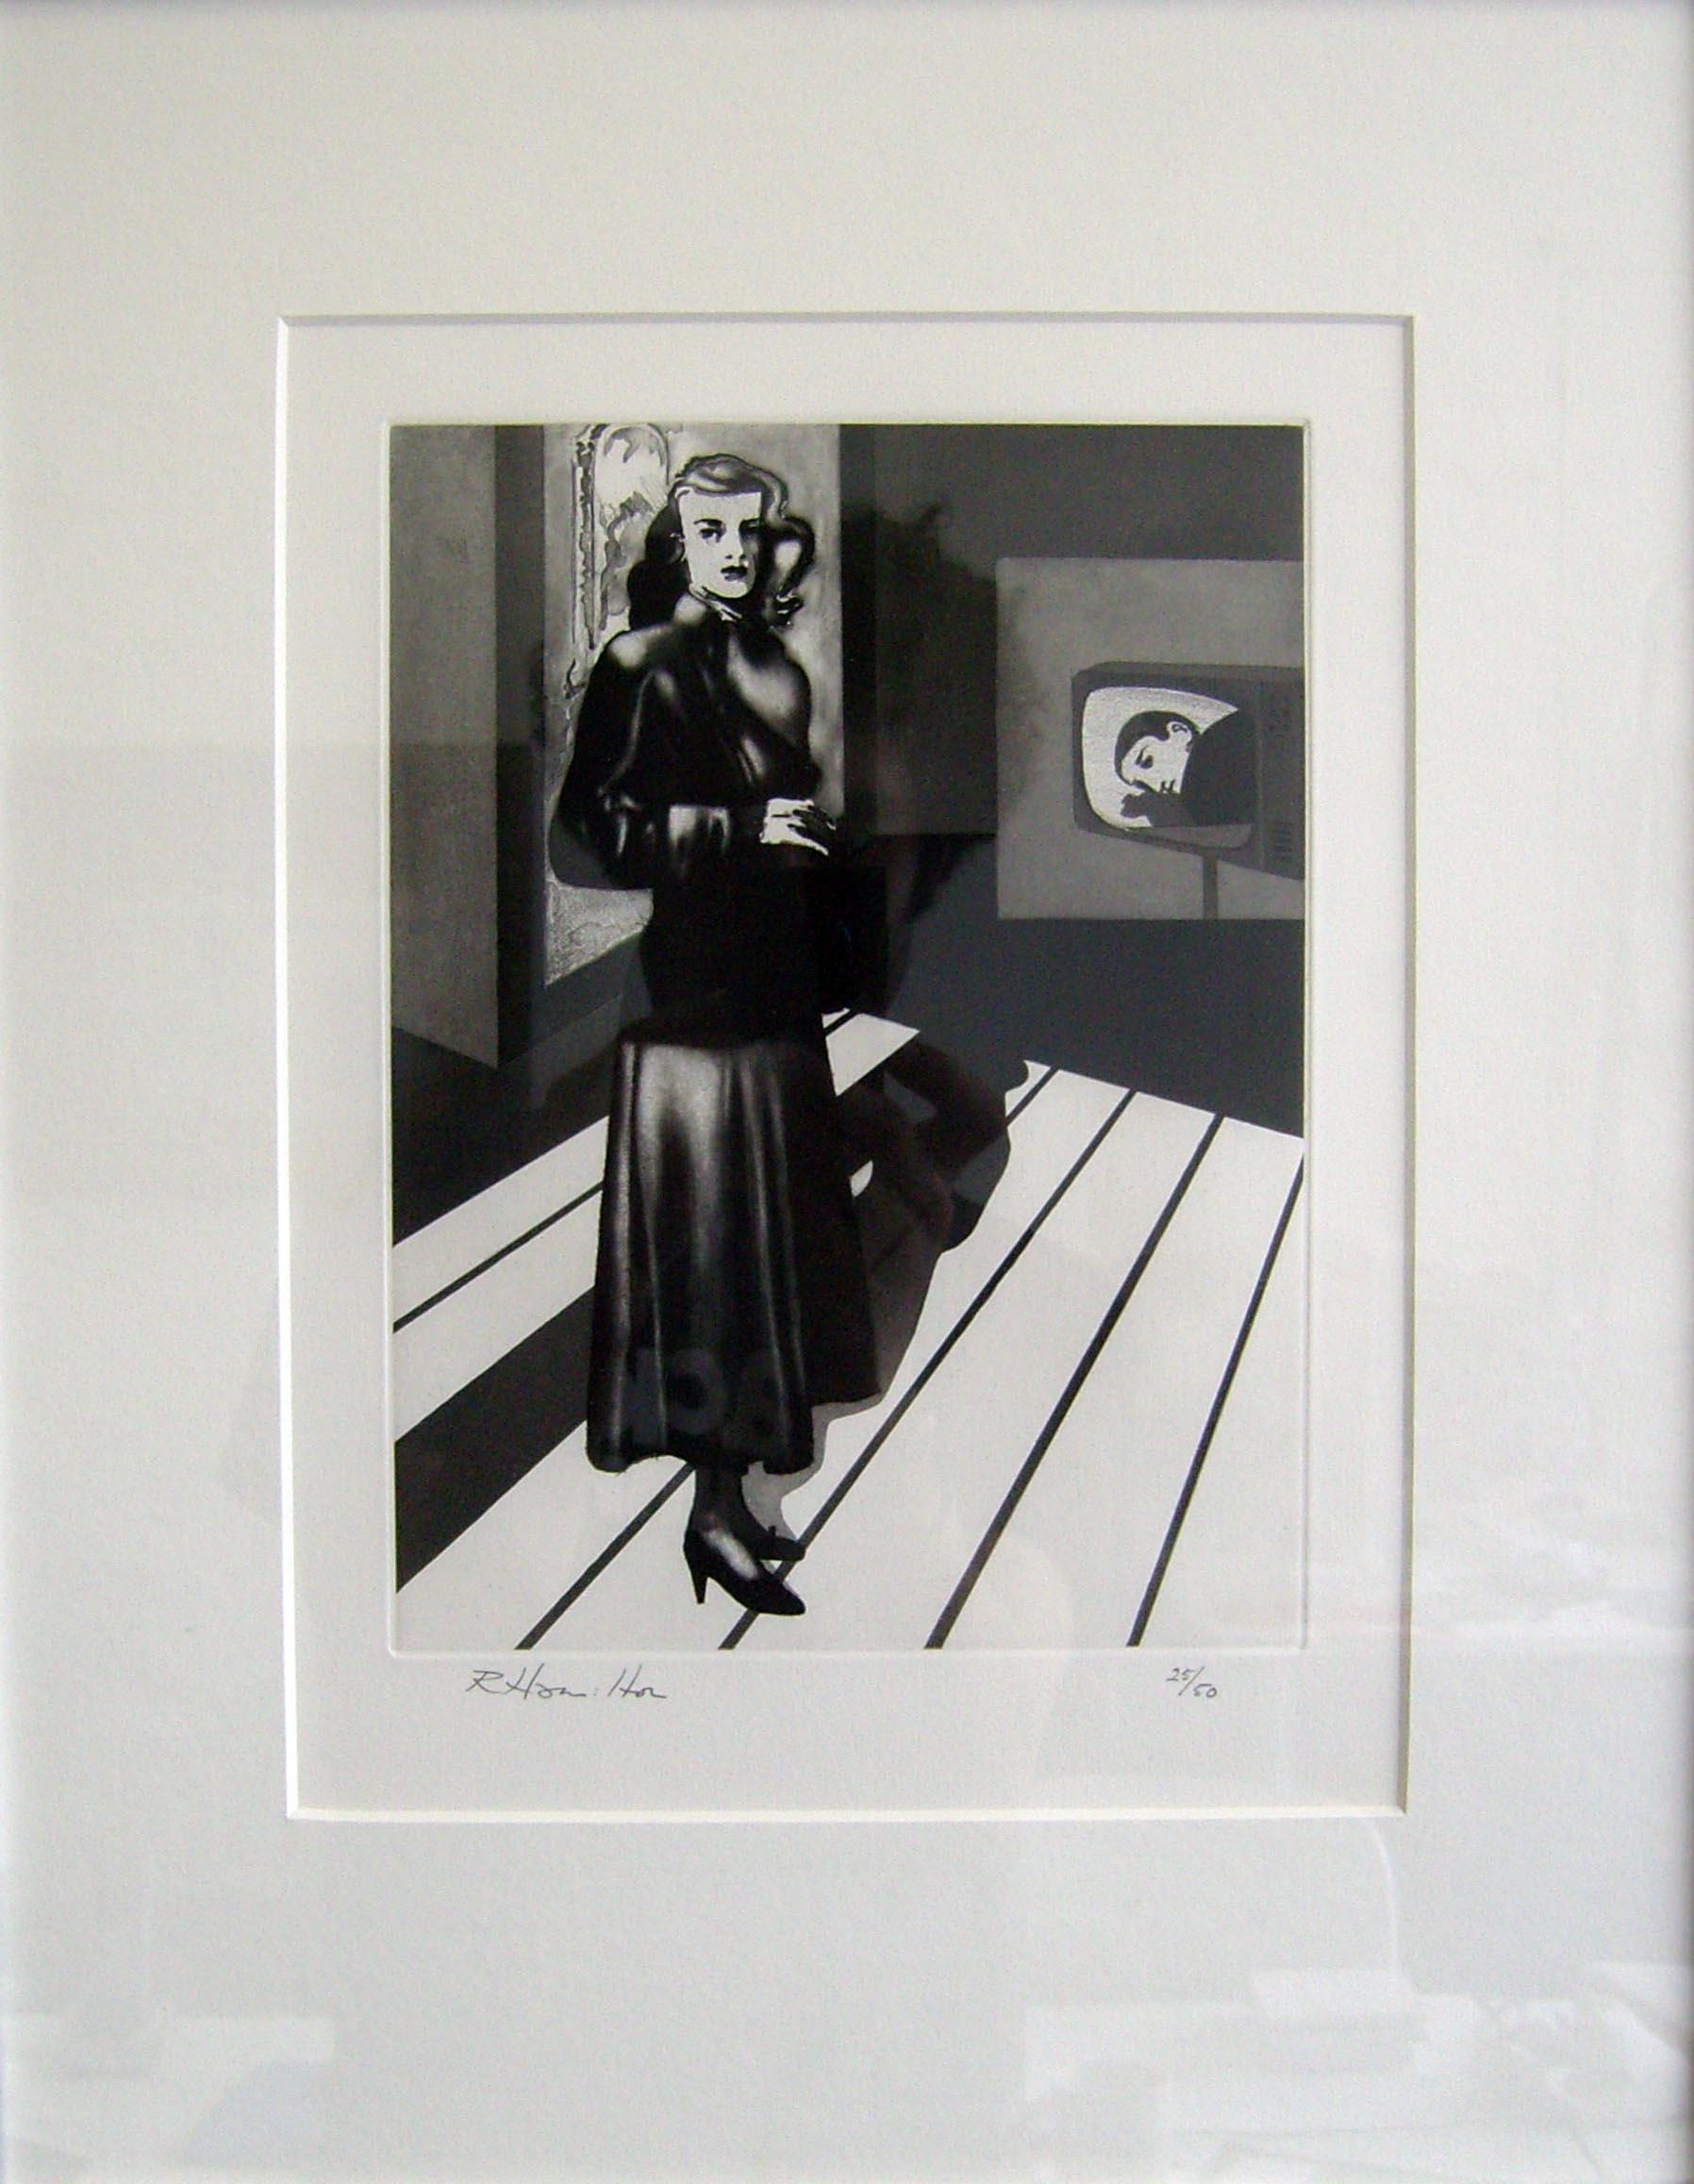 Richard Hamilton Patricia Knight III 1982 Soft, Lift Ground and Step Bite Aquatint Paper 38 x 28 cm/ Image 23.7 x 17.6 cm